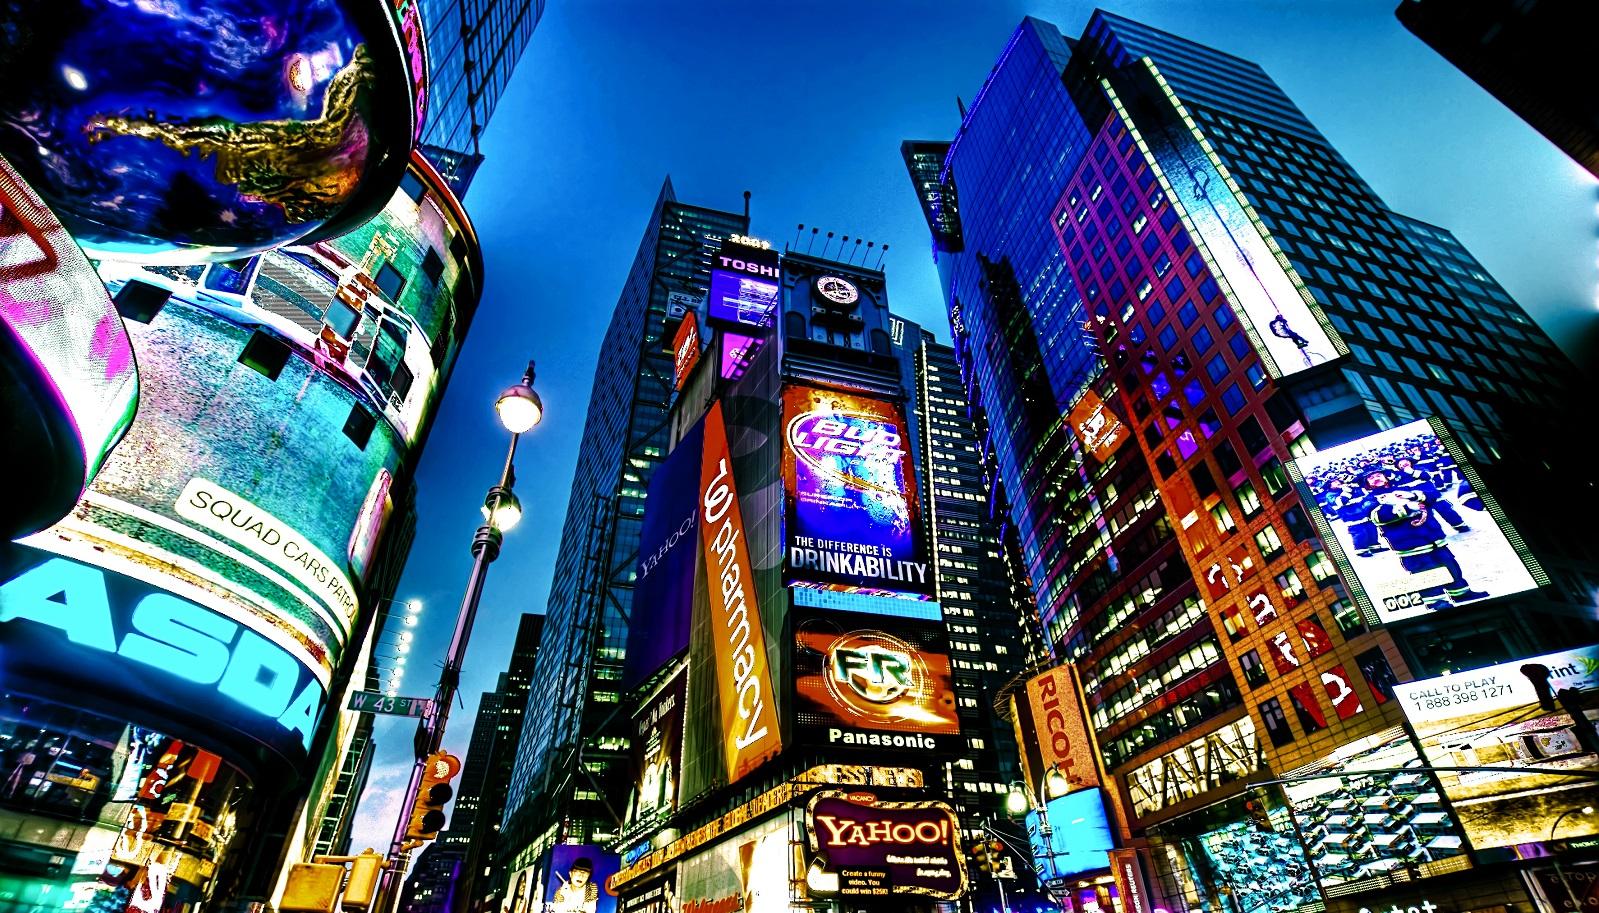 hotel zero degrees, blog, events, new york city, travel